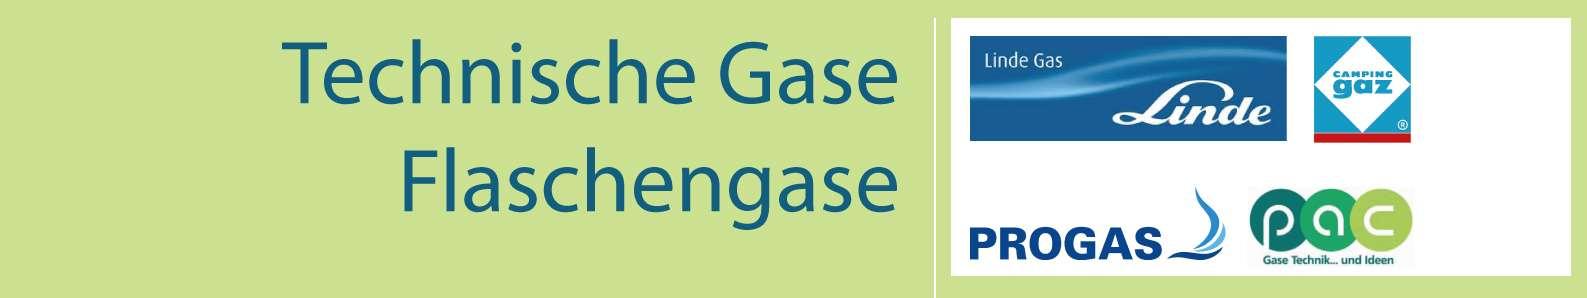 Energie/technische-gase.jpg